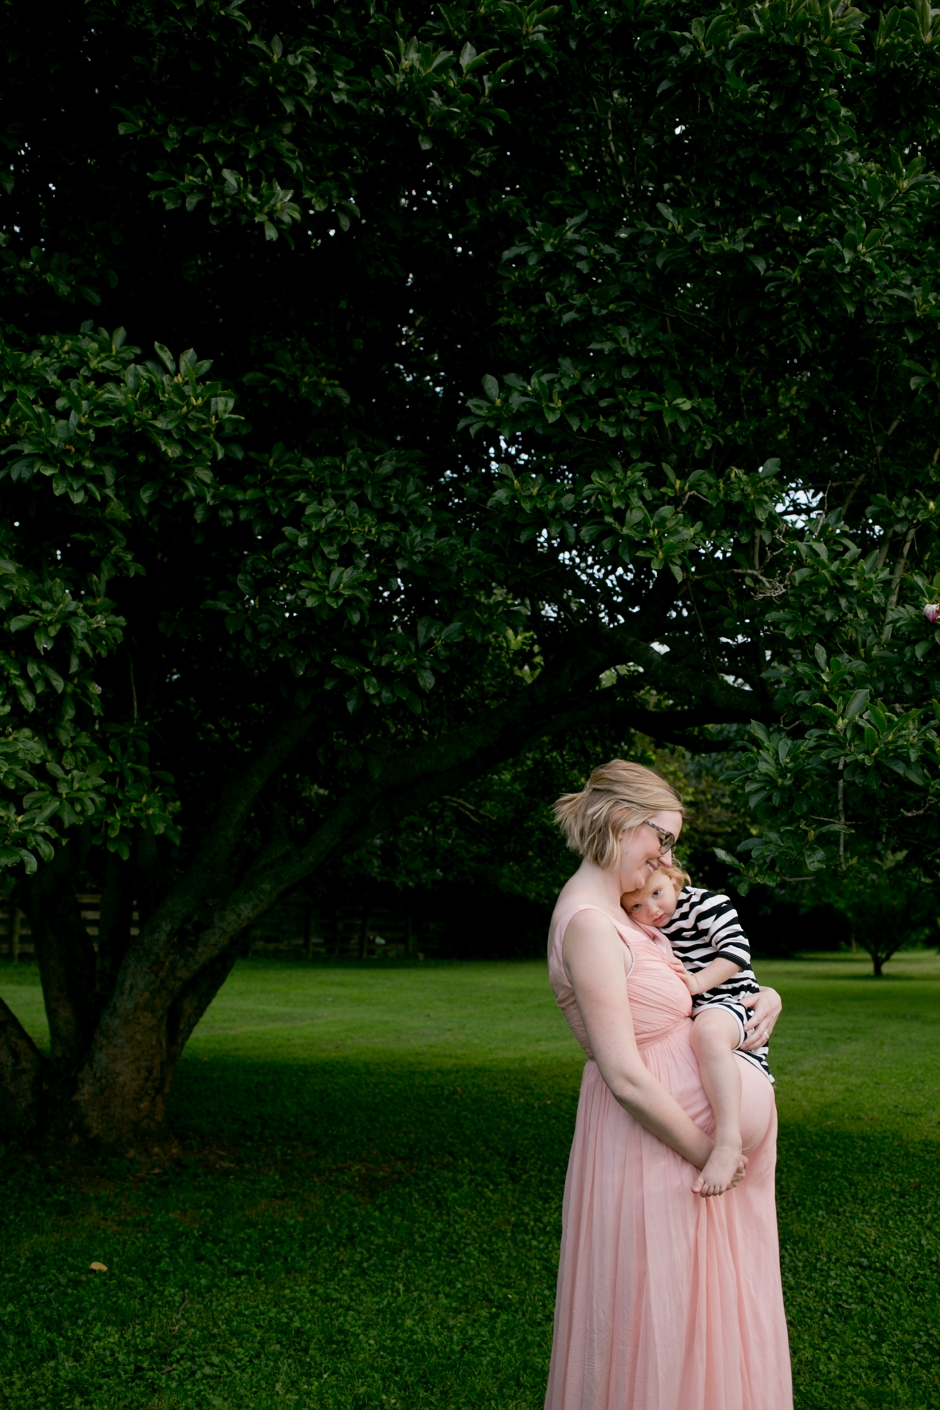 kentucky-maternity-jcrew-dress-1210